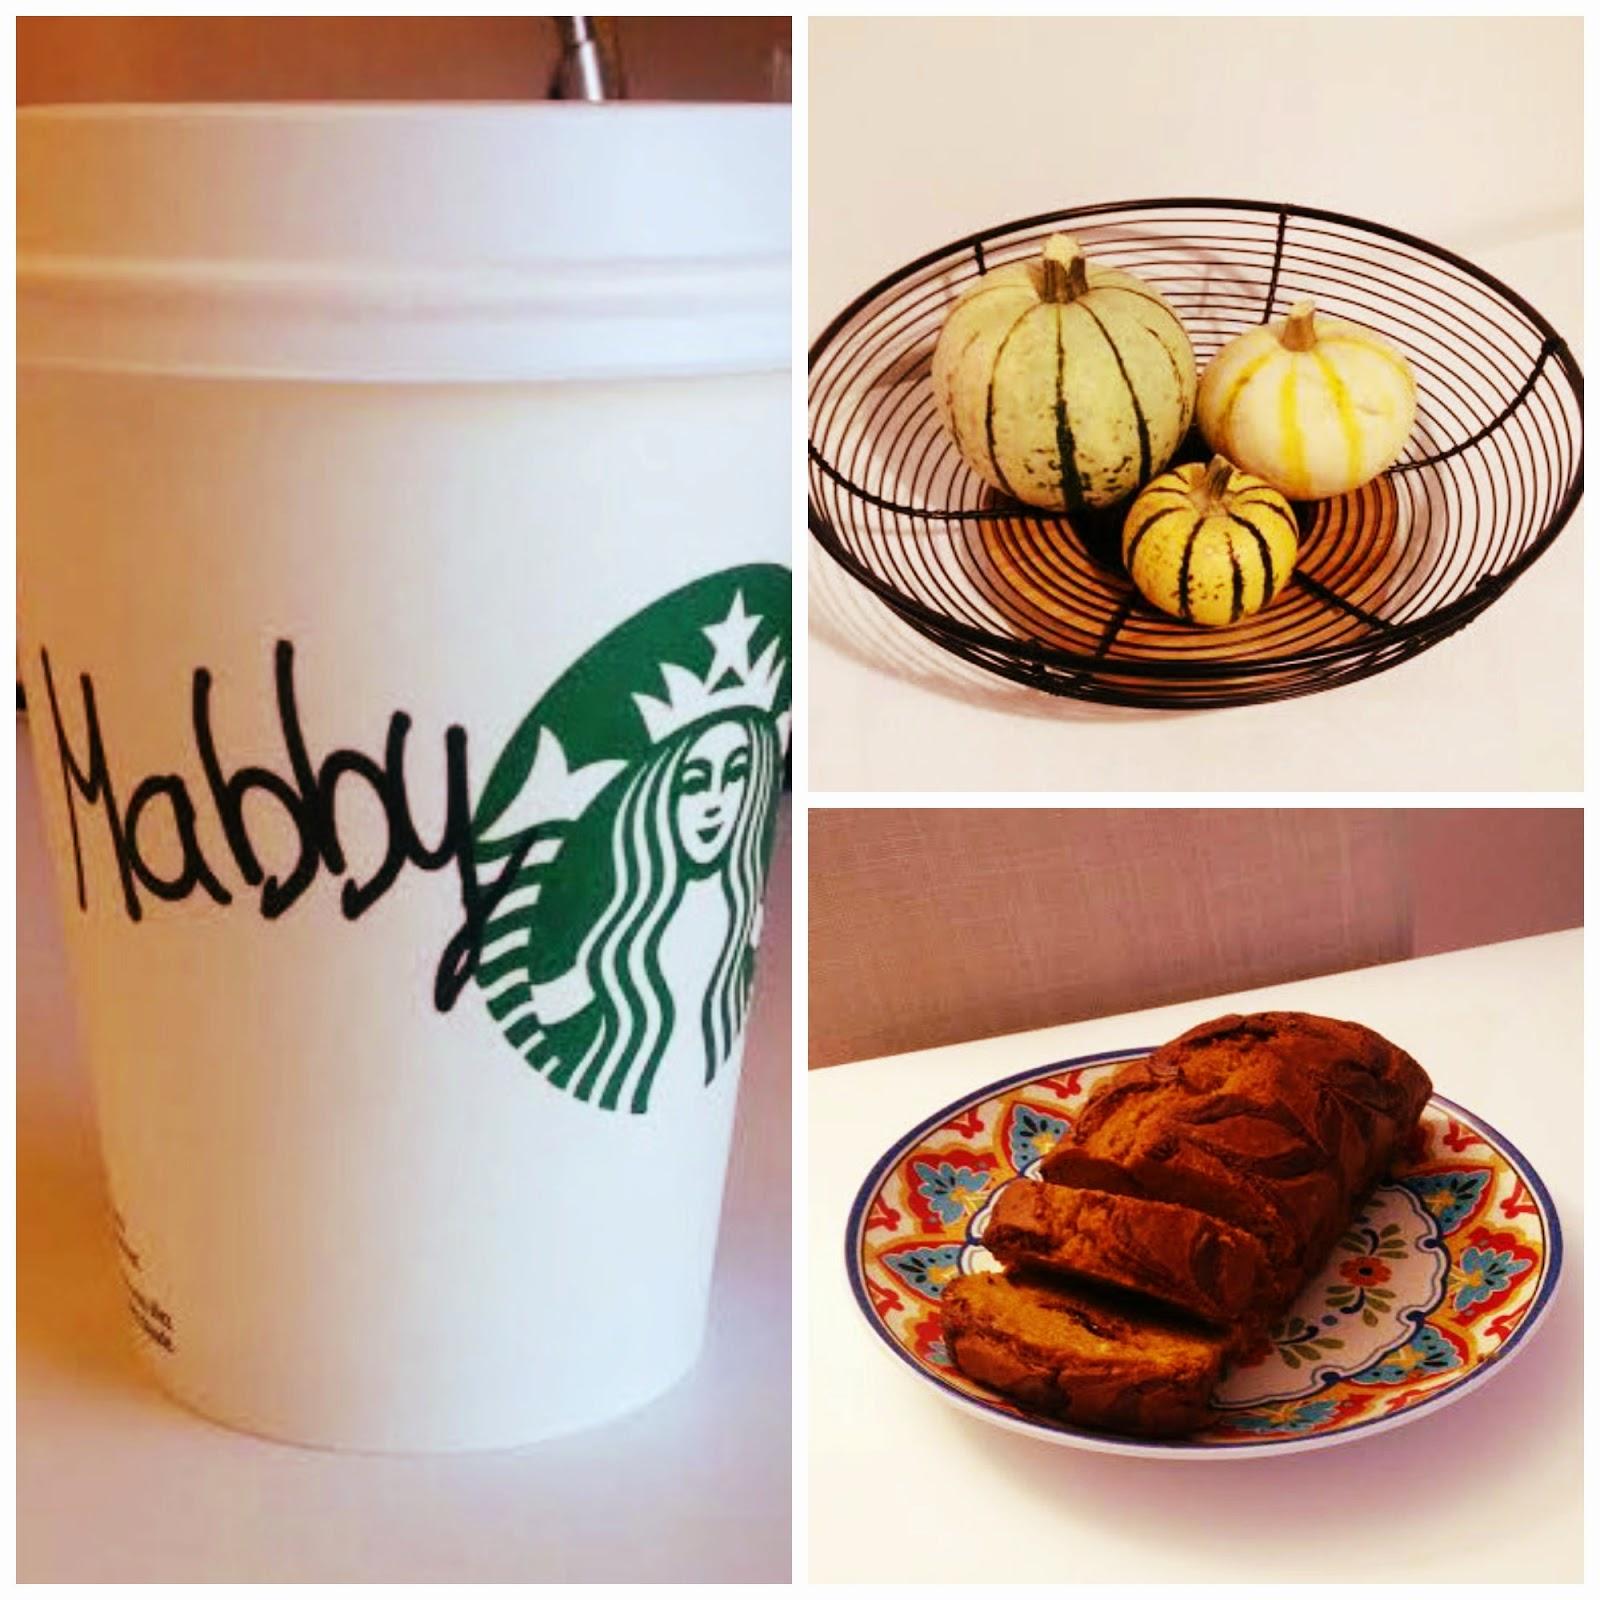 Starbucks Pumpkin Spice Latte, gourds, pumpkin bread